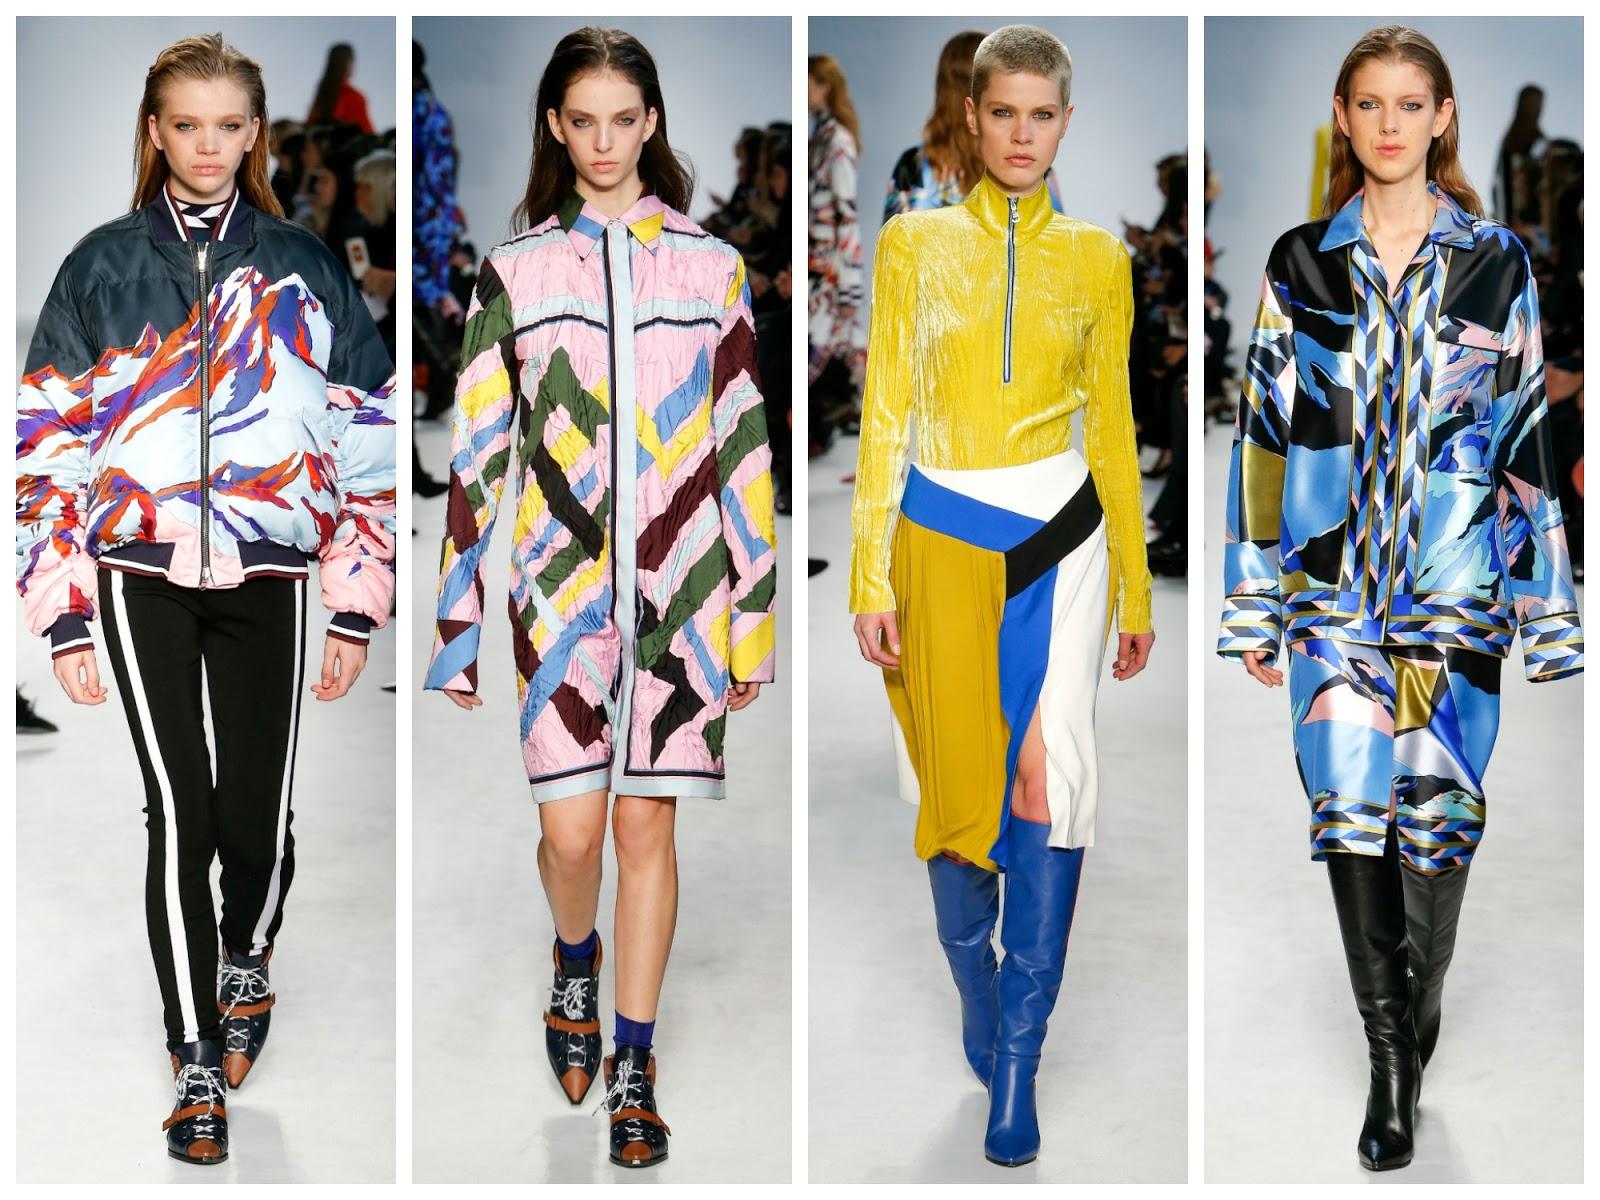 emilio-pucci-fall-winter-2016-fashion-show-collection-milan